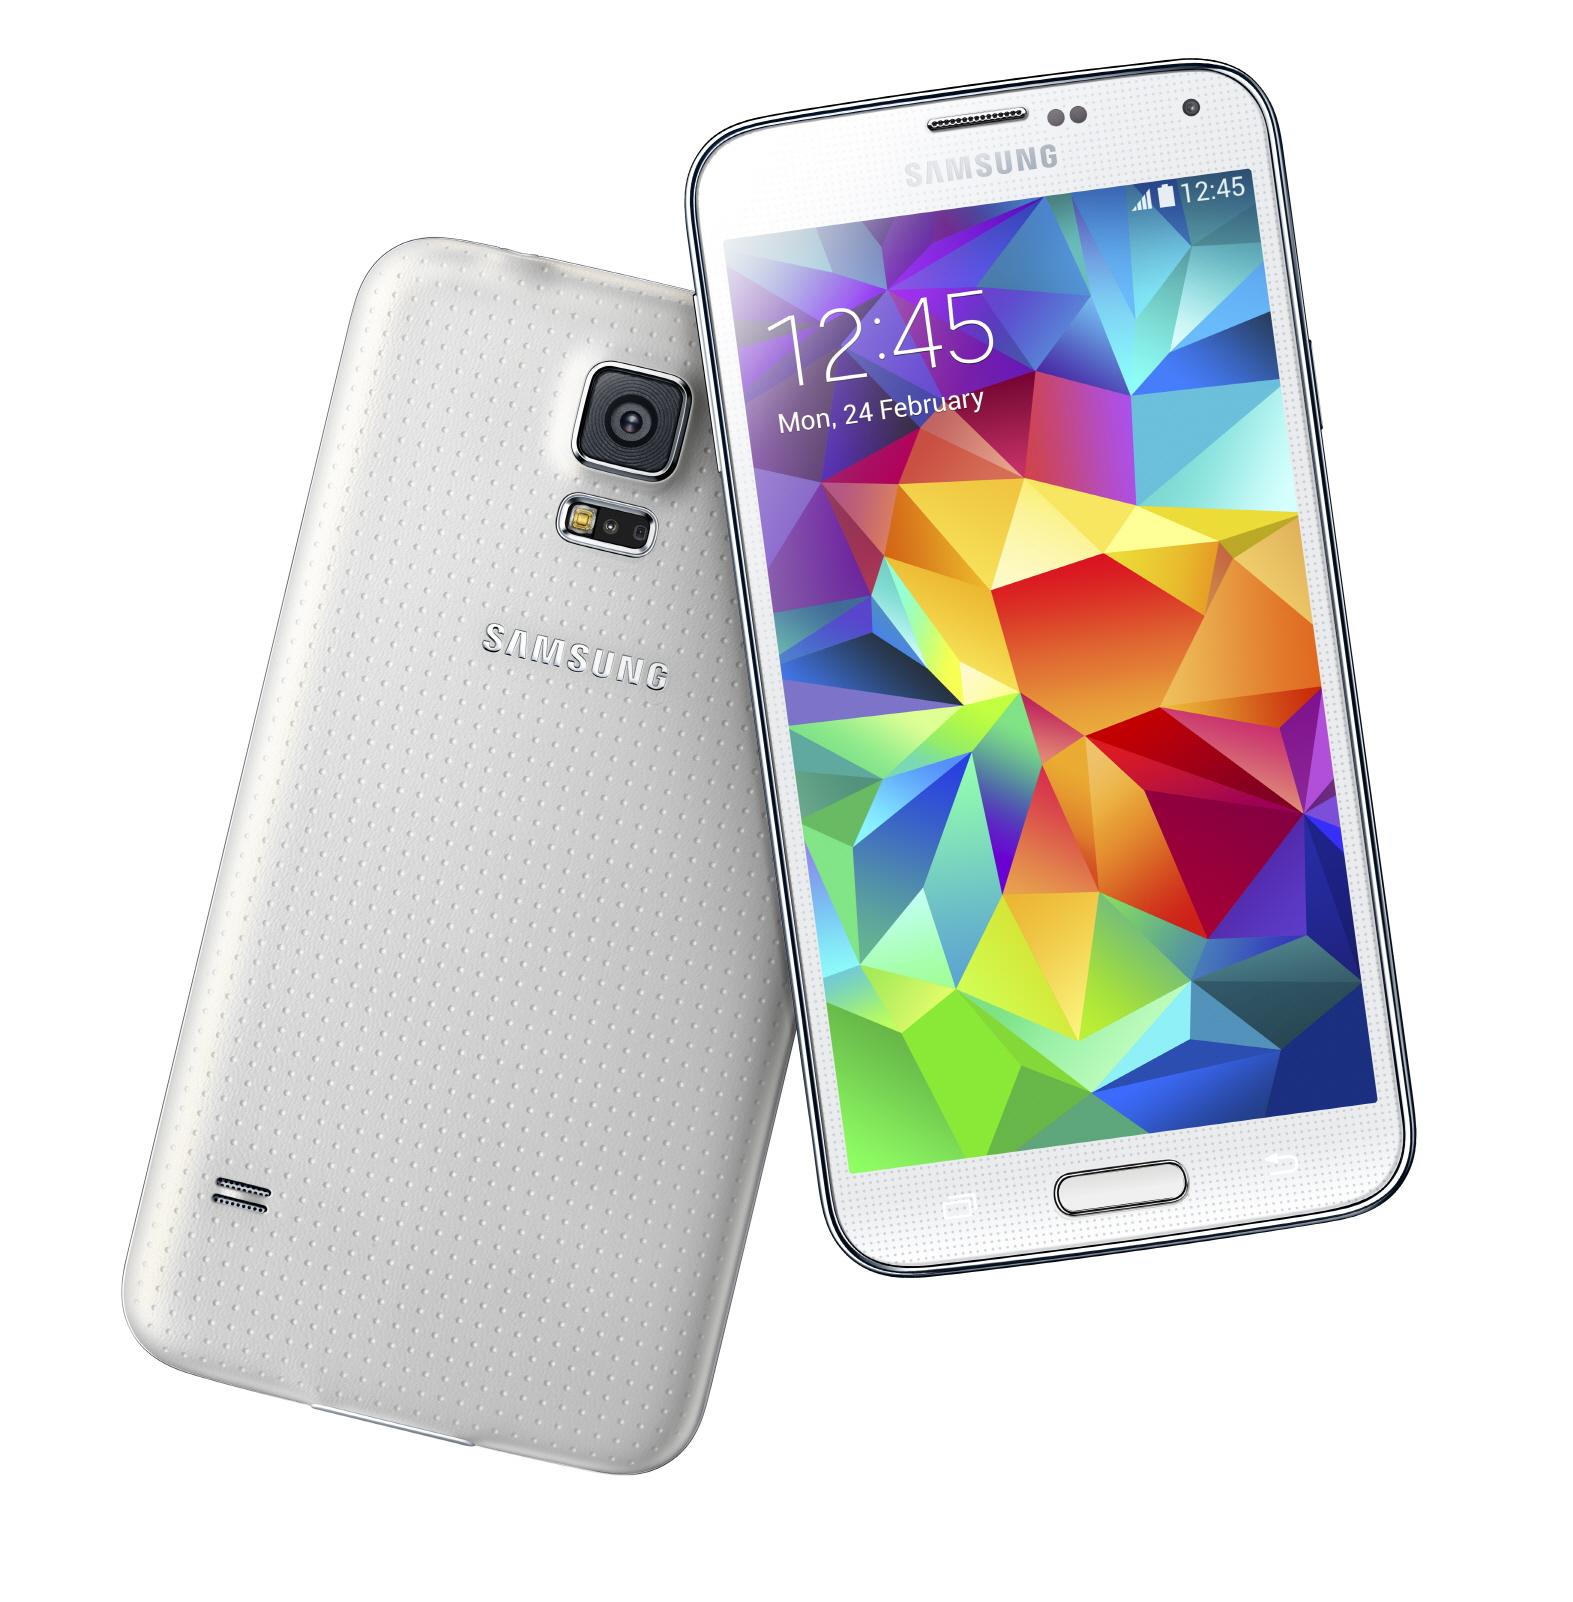 Samsung-Galaxy-S5-image-3